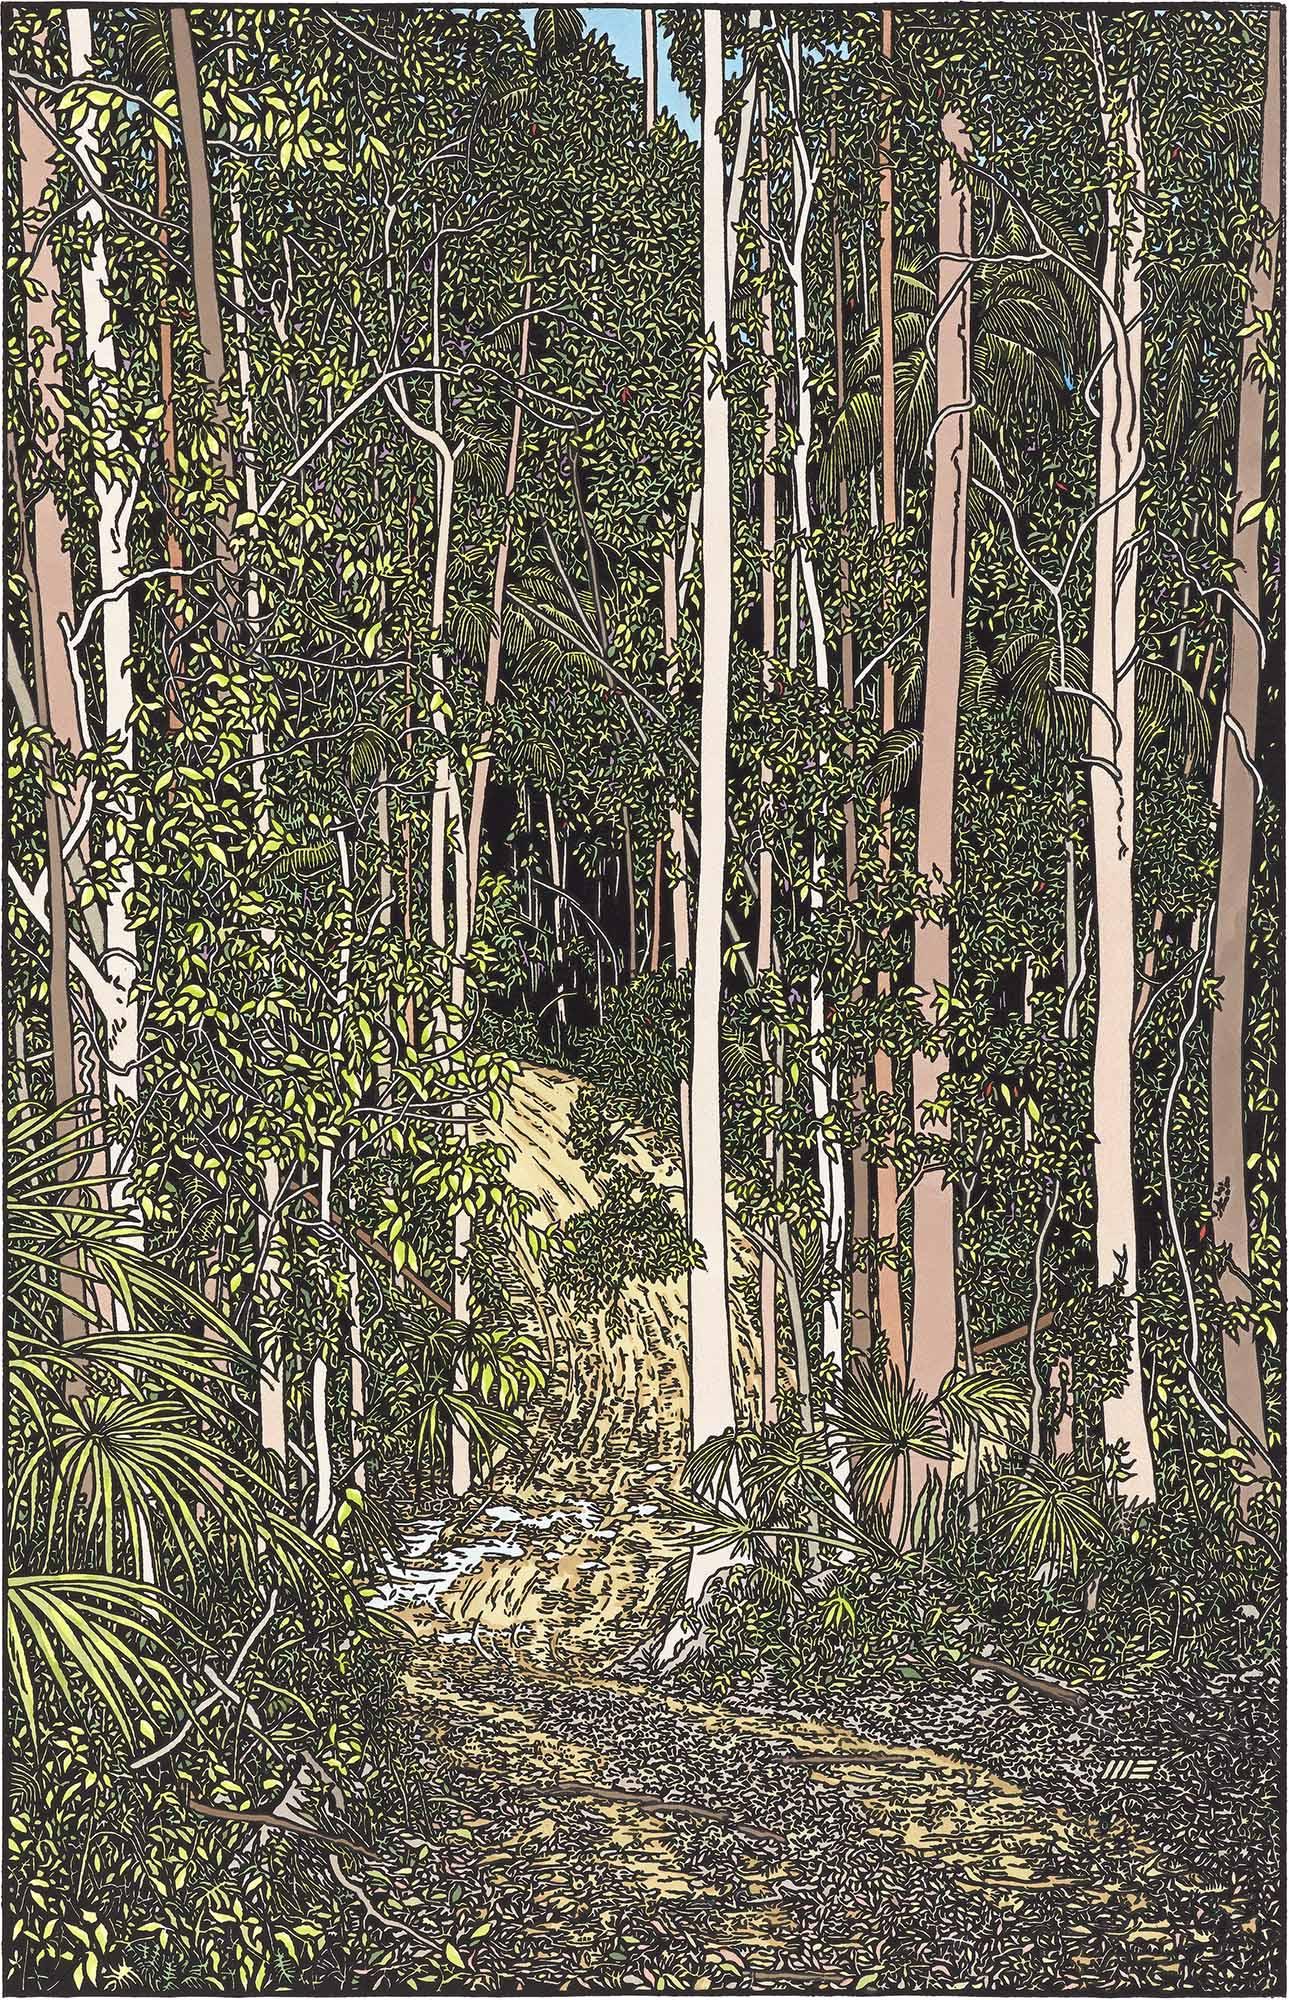 Wayne singleton 023 road through the rainforest at ilkley 2000px j3fub8